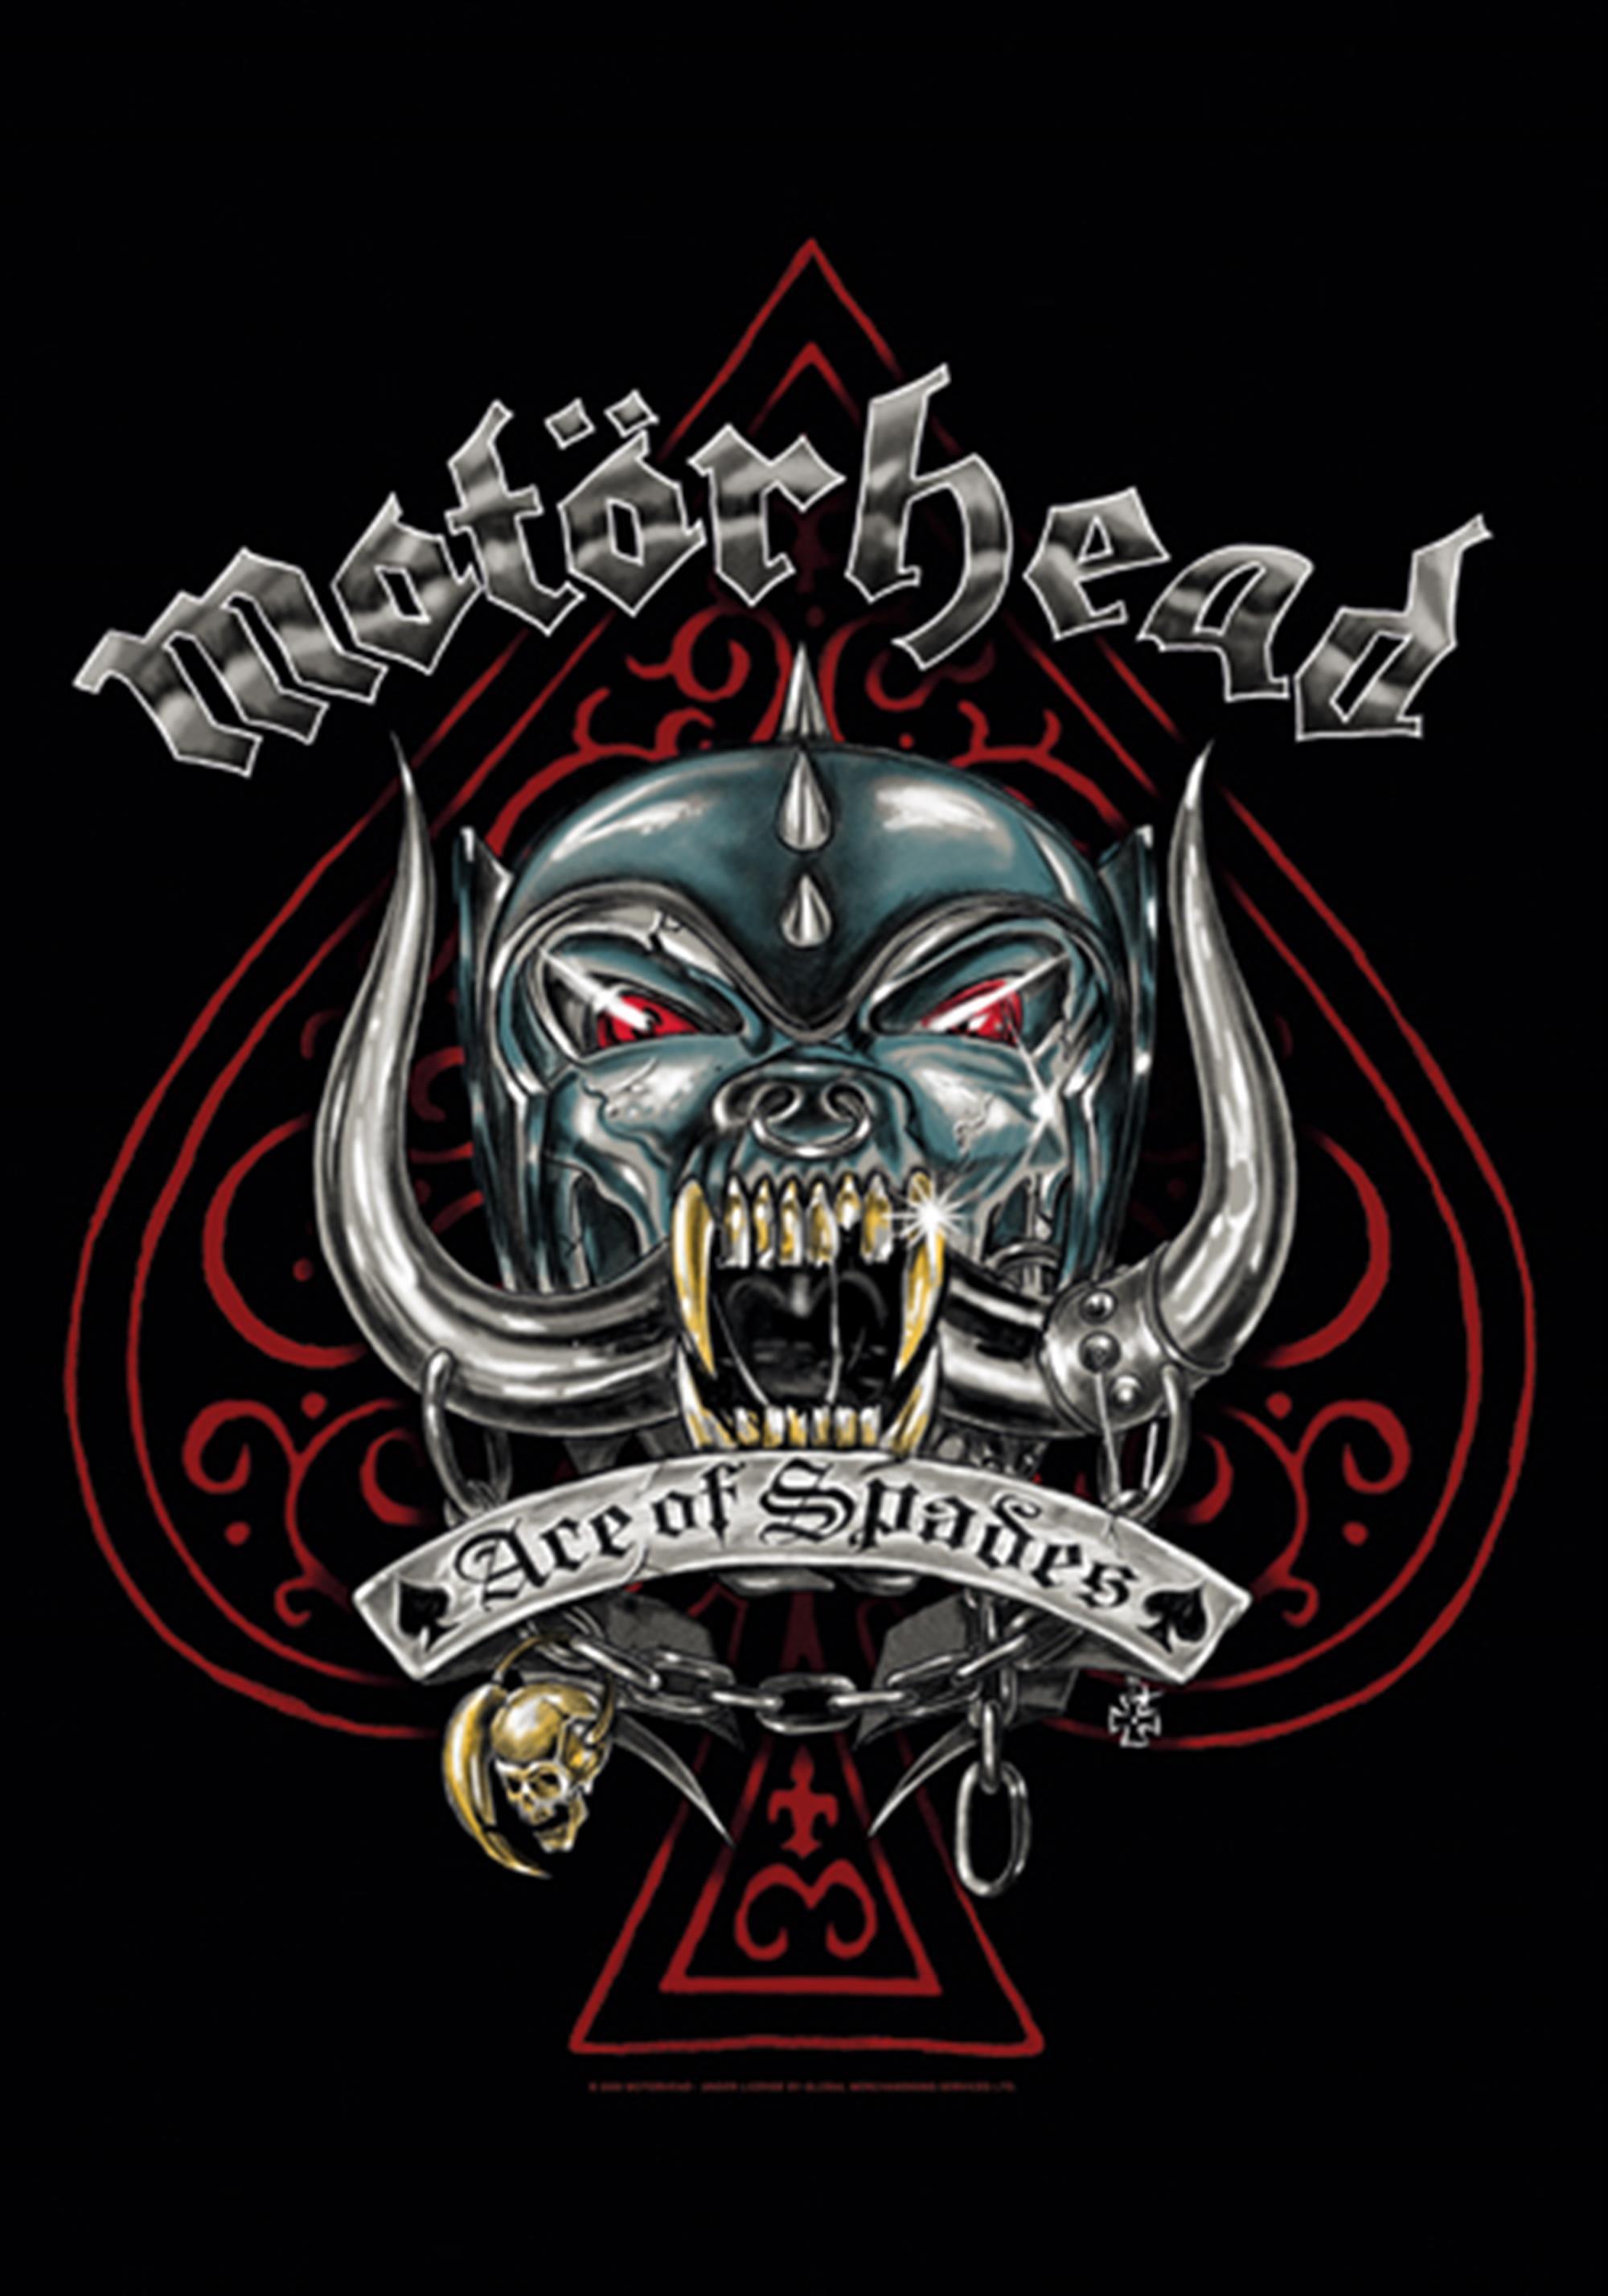 Ace Of Spades Tattoo